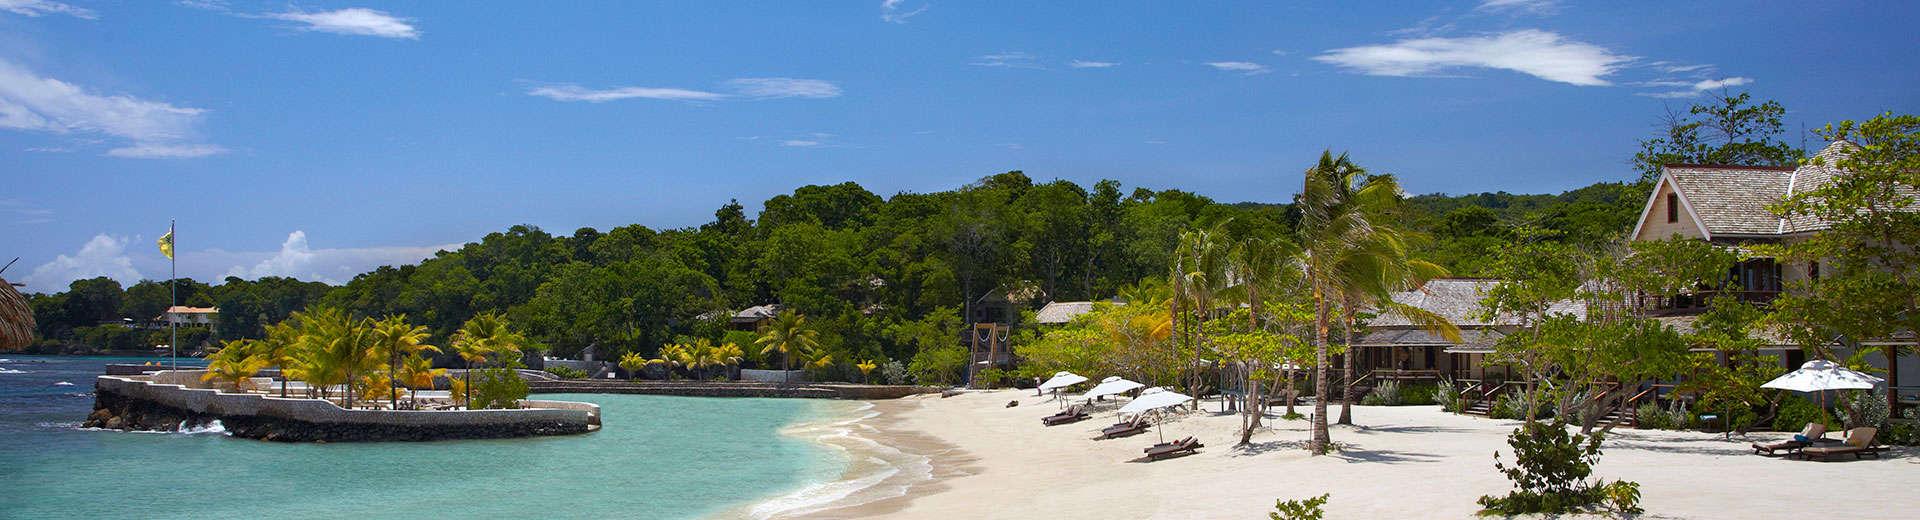 goldeneye jamaica pool caribbean